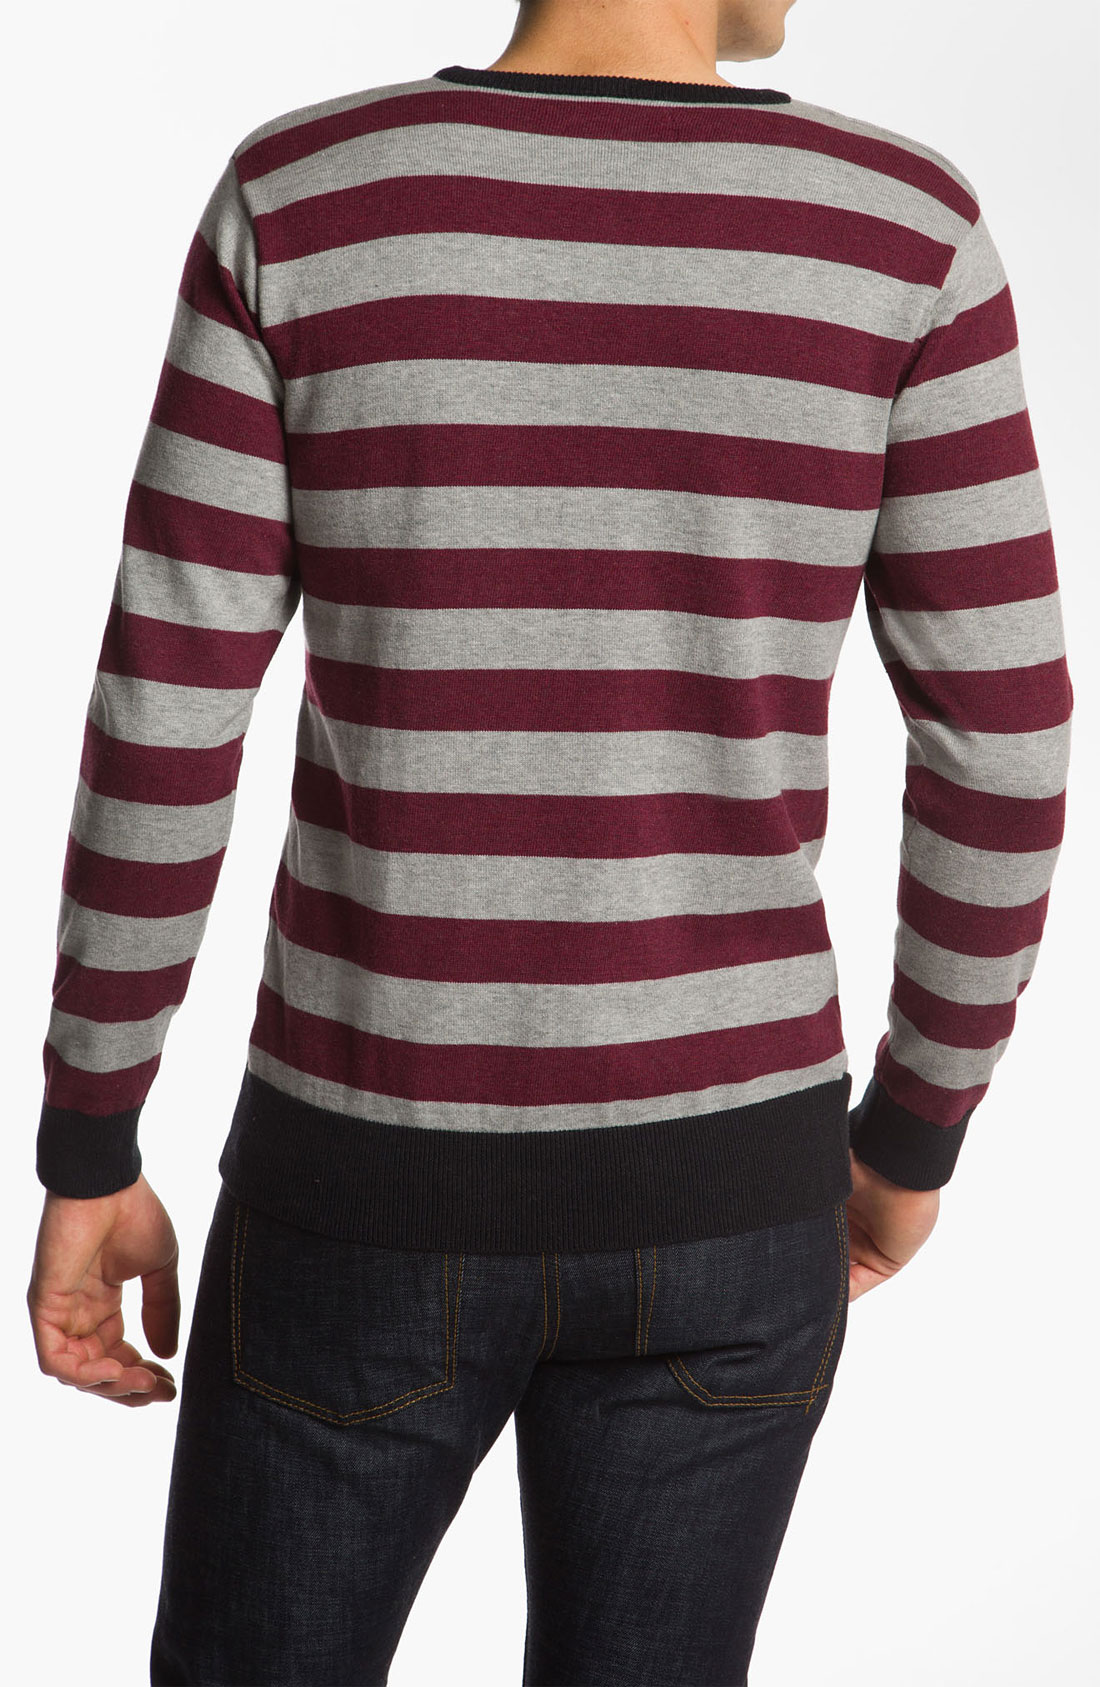 Circle Sweater: Volcom Other Circle Crewneck Sweater For Men